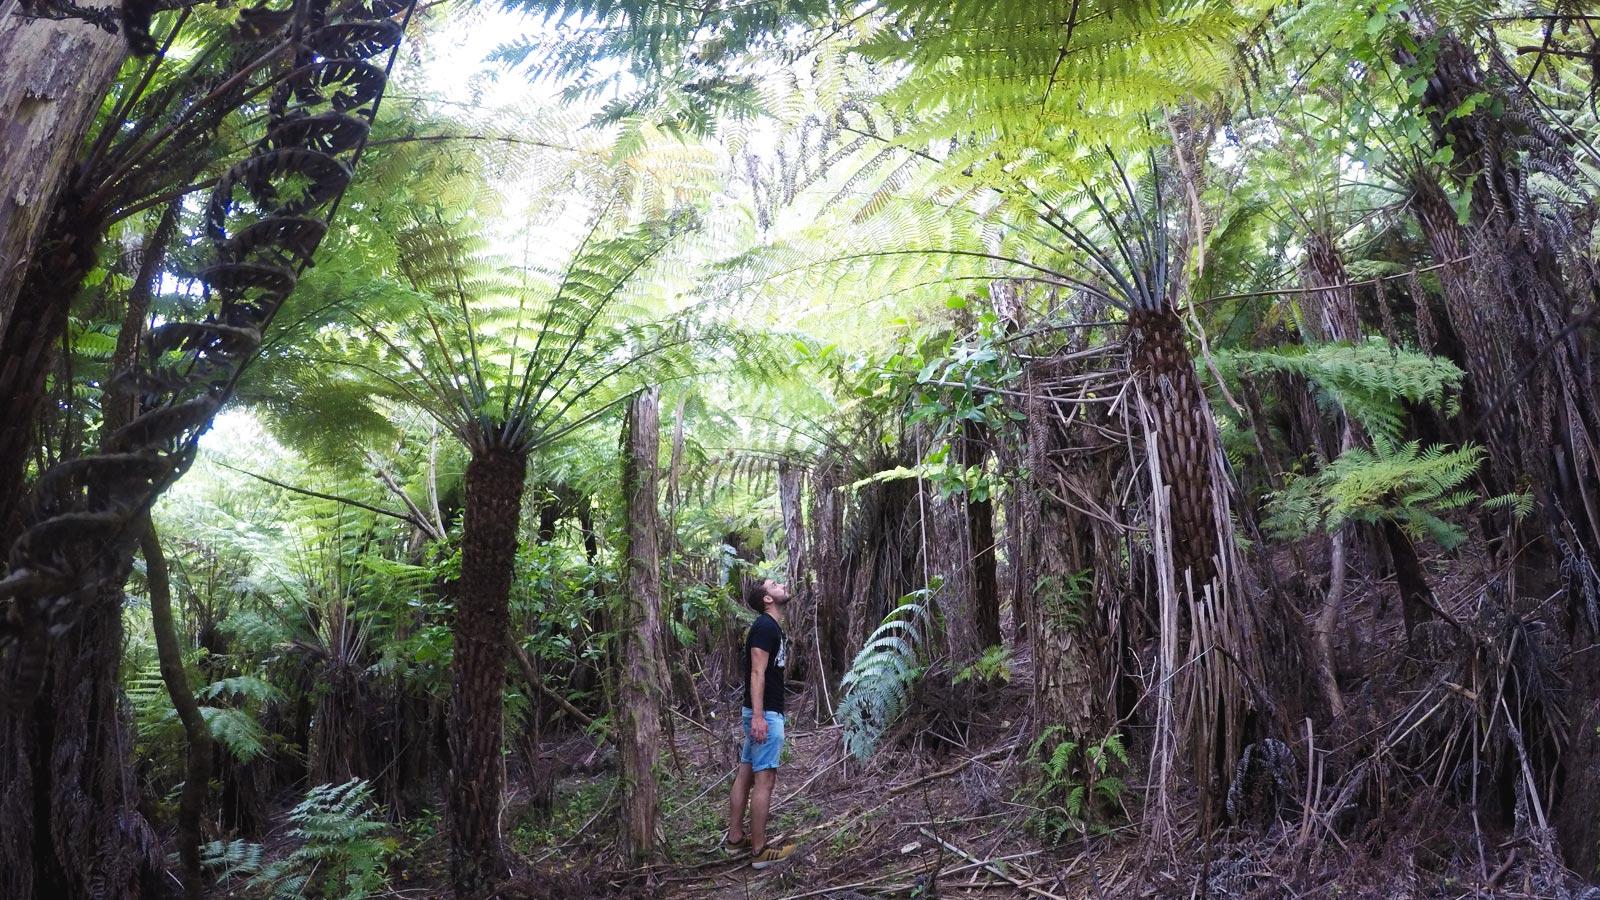 Marlborough Sounds aktive Gruppenreise Neuseeland Südinsel traveljunkies